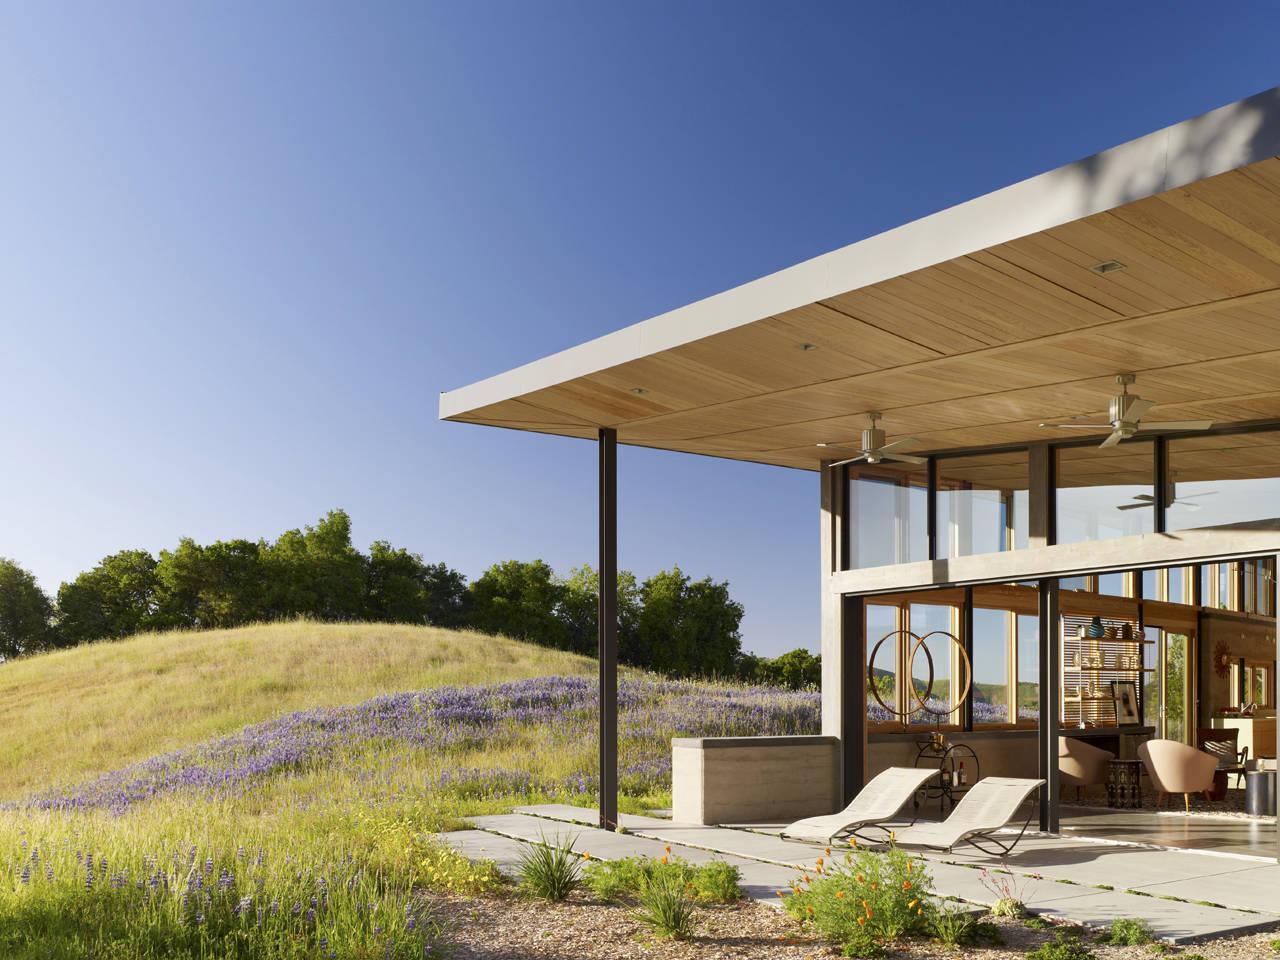 gallery of caterpillar house feldman architecture 6 ForFeldman Architecture